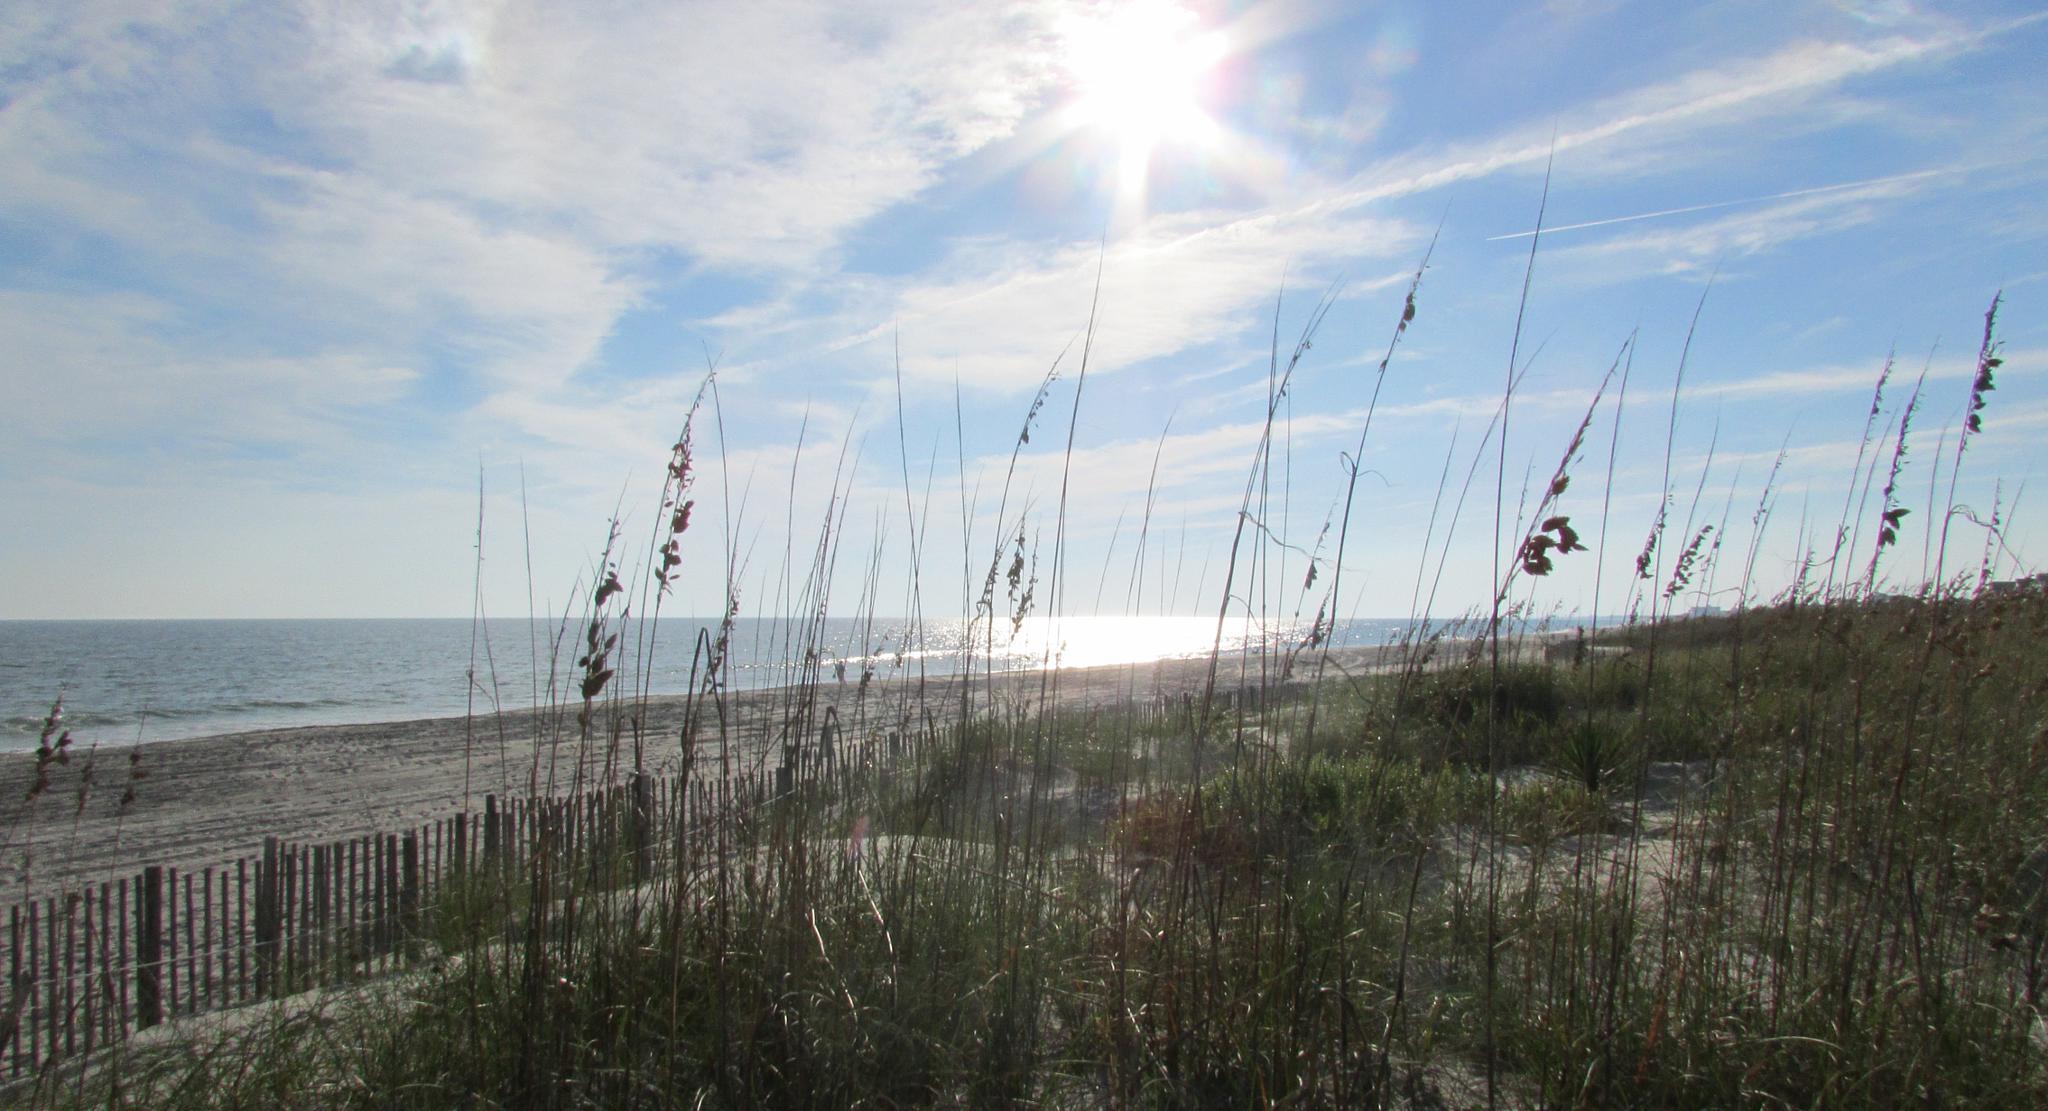 On the Dunes at Atlantic Beach, North Carolina by Lisa Marshall Moore